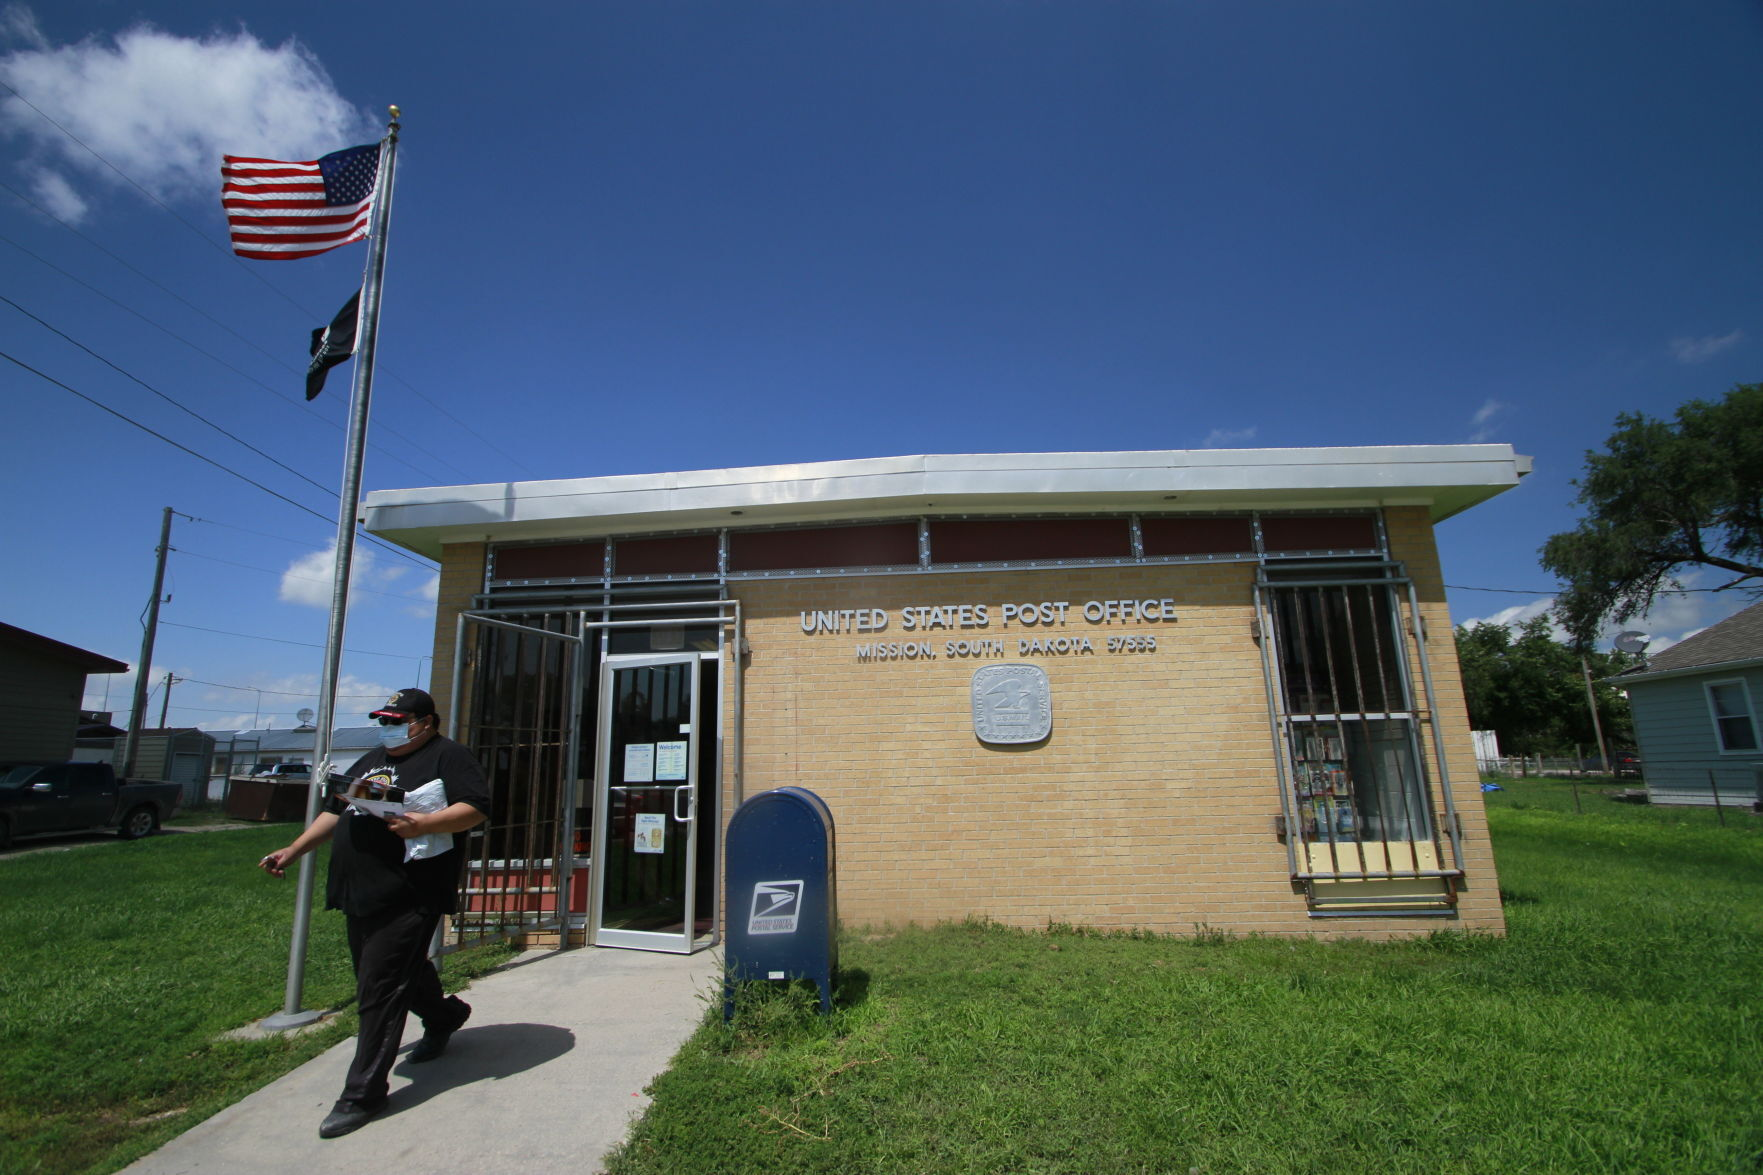 Tribal members join voter lawsuit against South Dakota